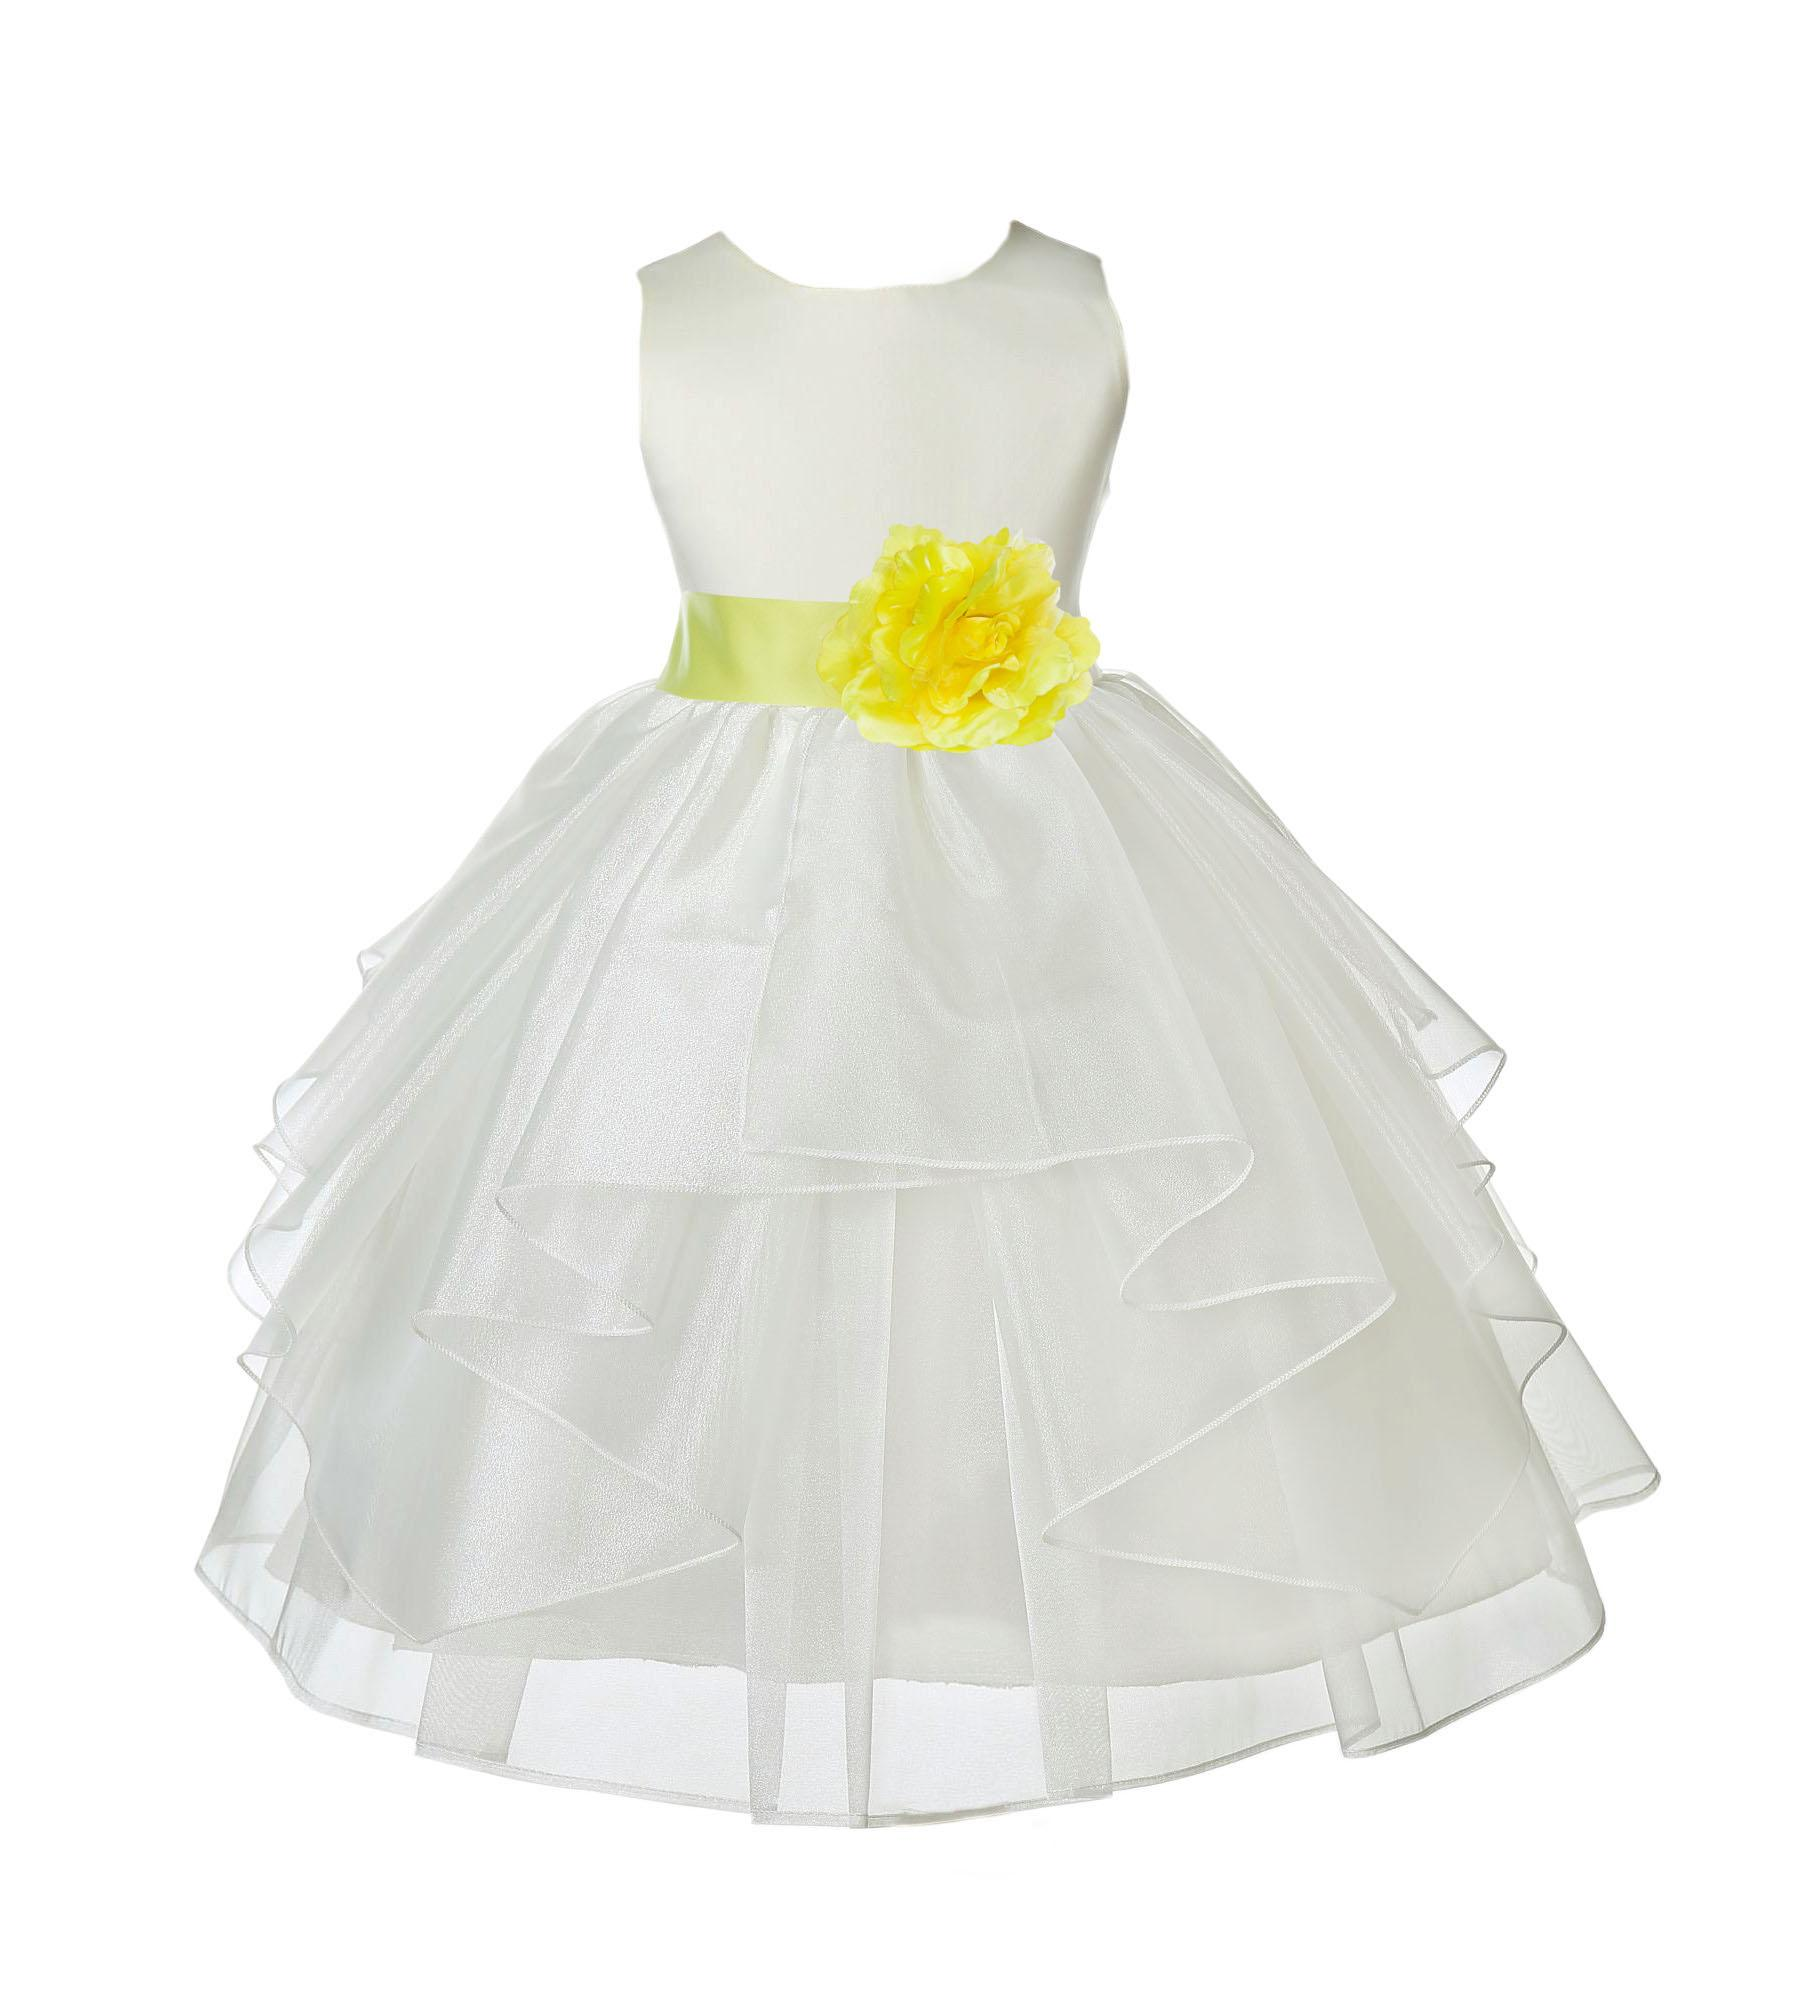 OFF WHITE Flower Girl Dress Party Wedding Graduation Recital Bridesmaid Birthday